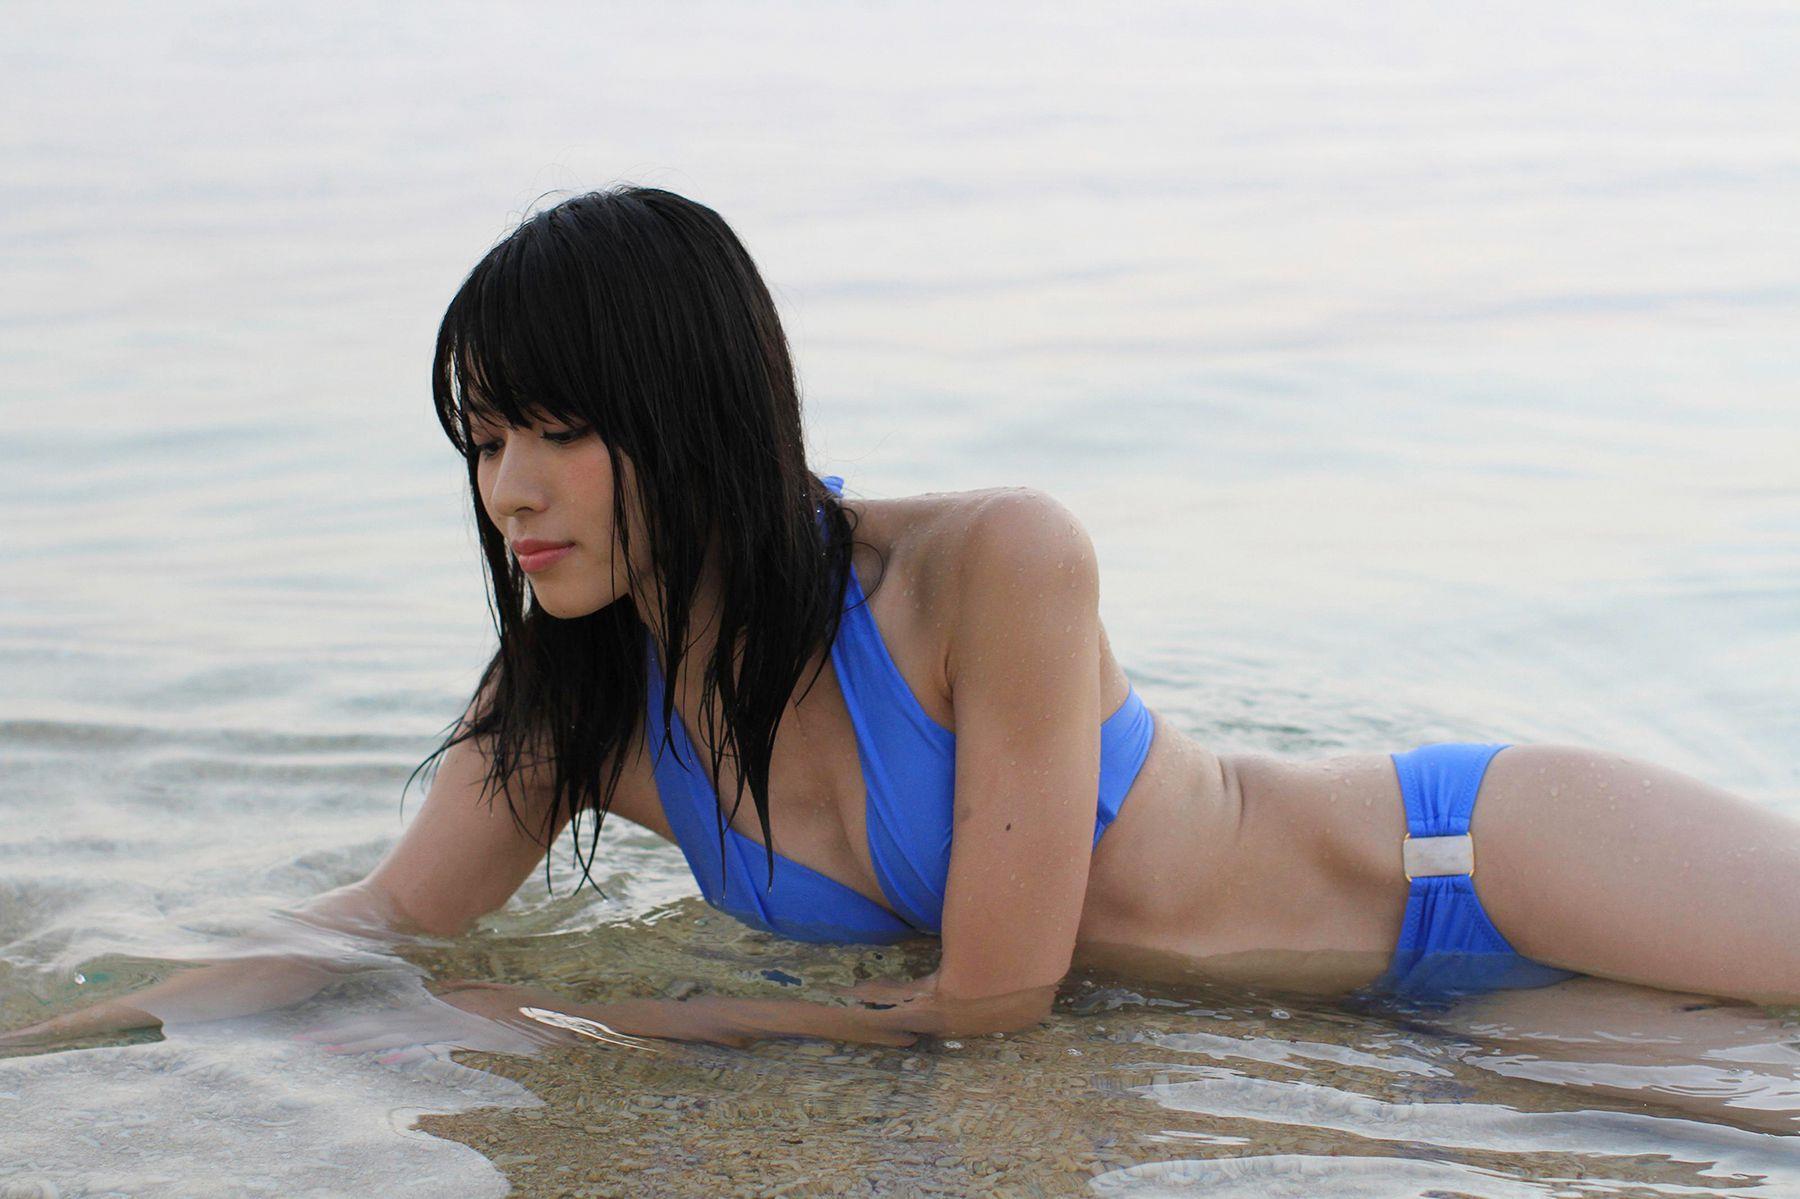 矢島舞美 エロ画像 82